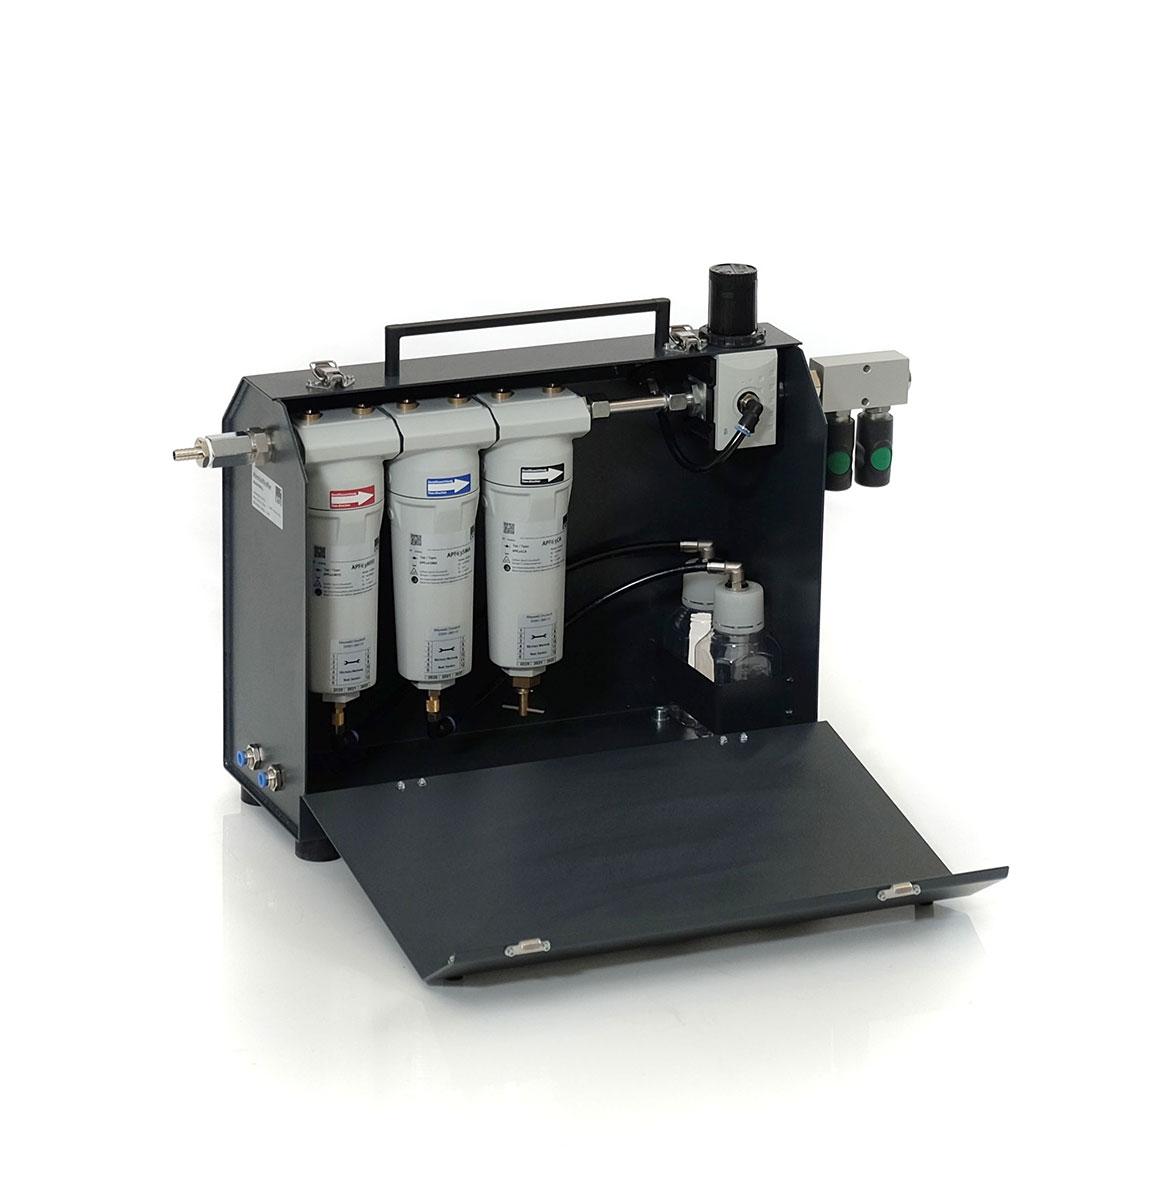 KSI Filtertechnik MAK63 Mobiles Atemluftsystem mit 3-facher Filterstufe